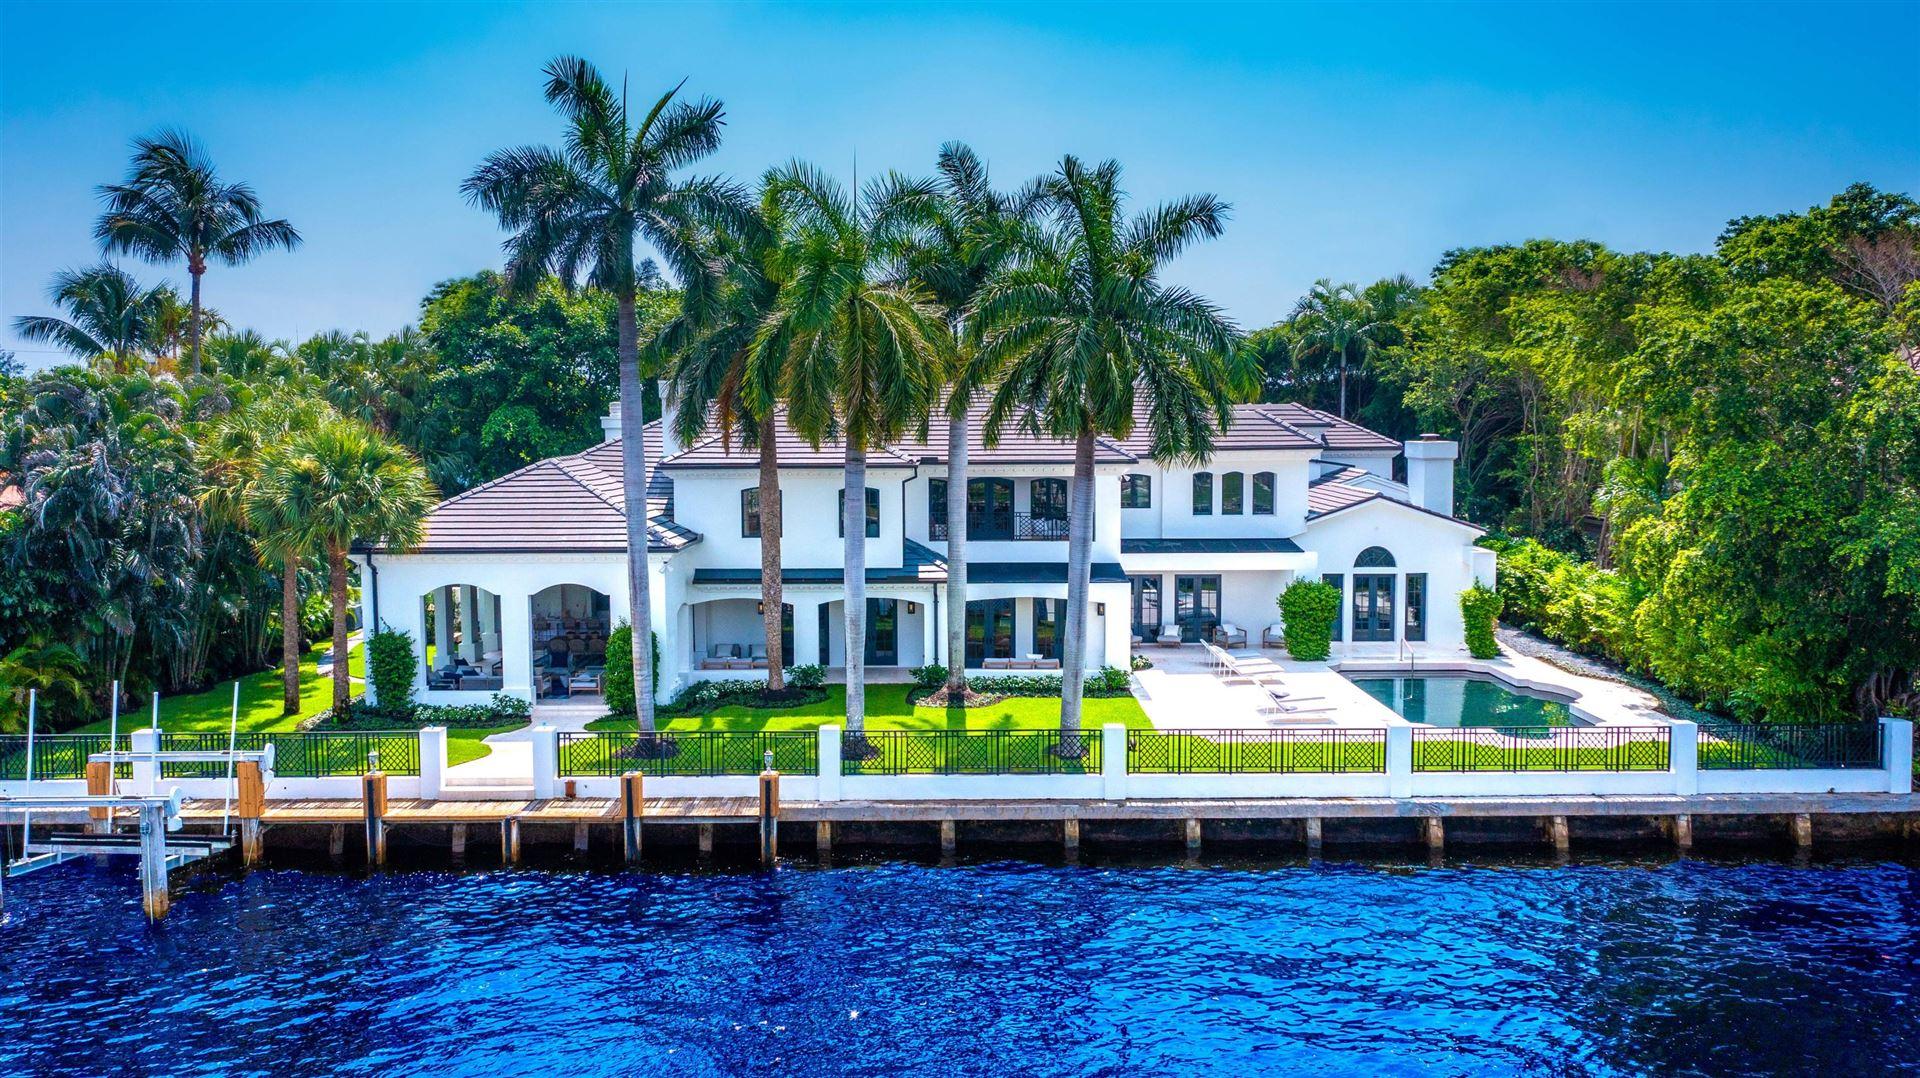 2401 Spanish River Road, Boca Raton, FL 33432 - MLS#: RX-10630806